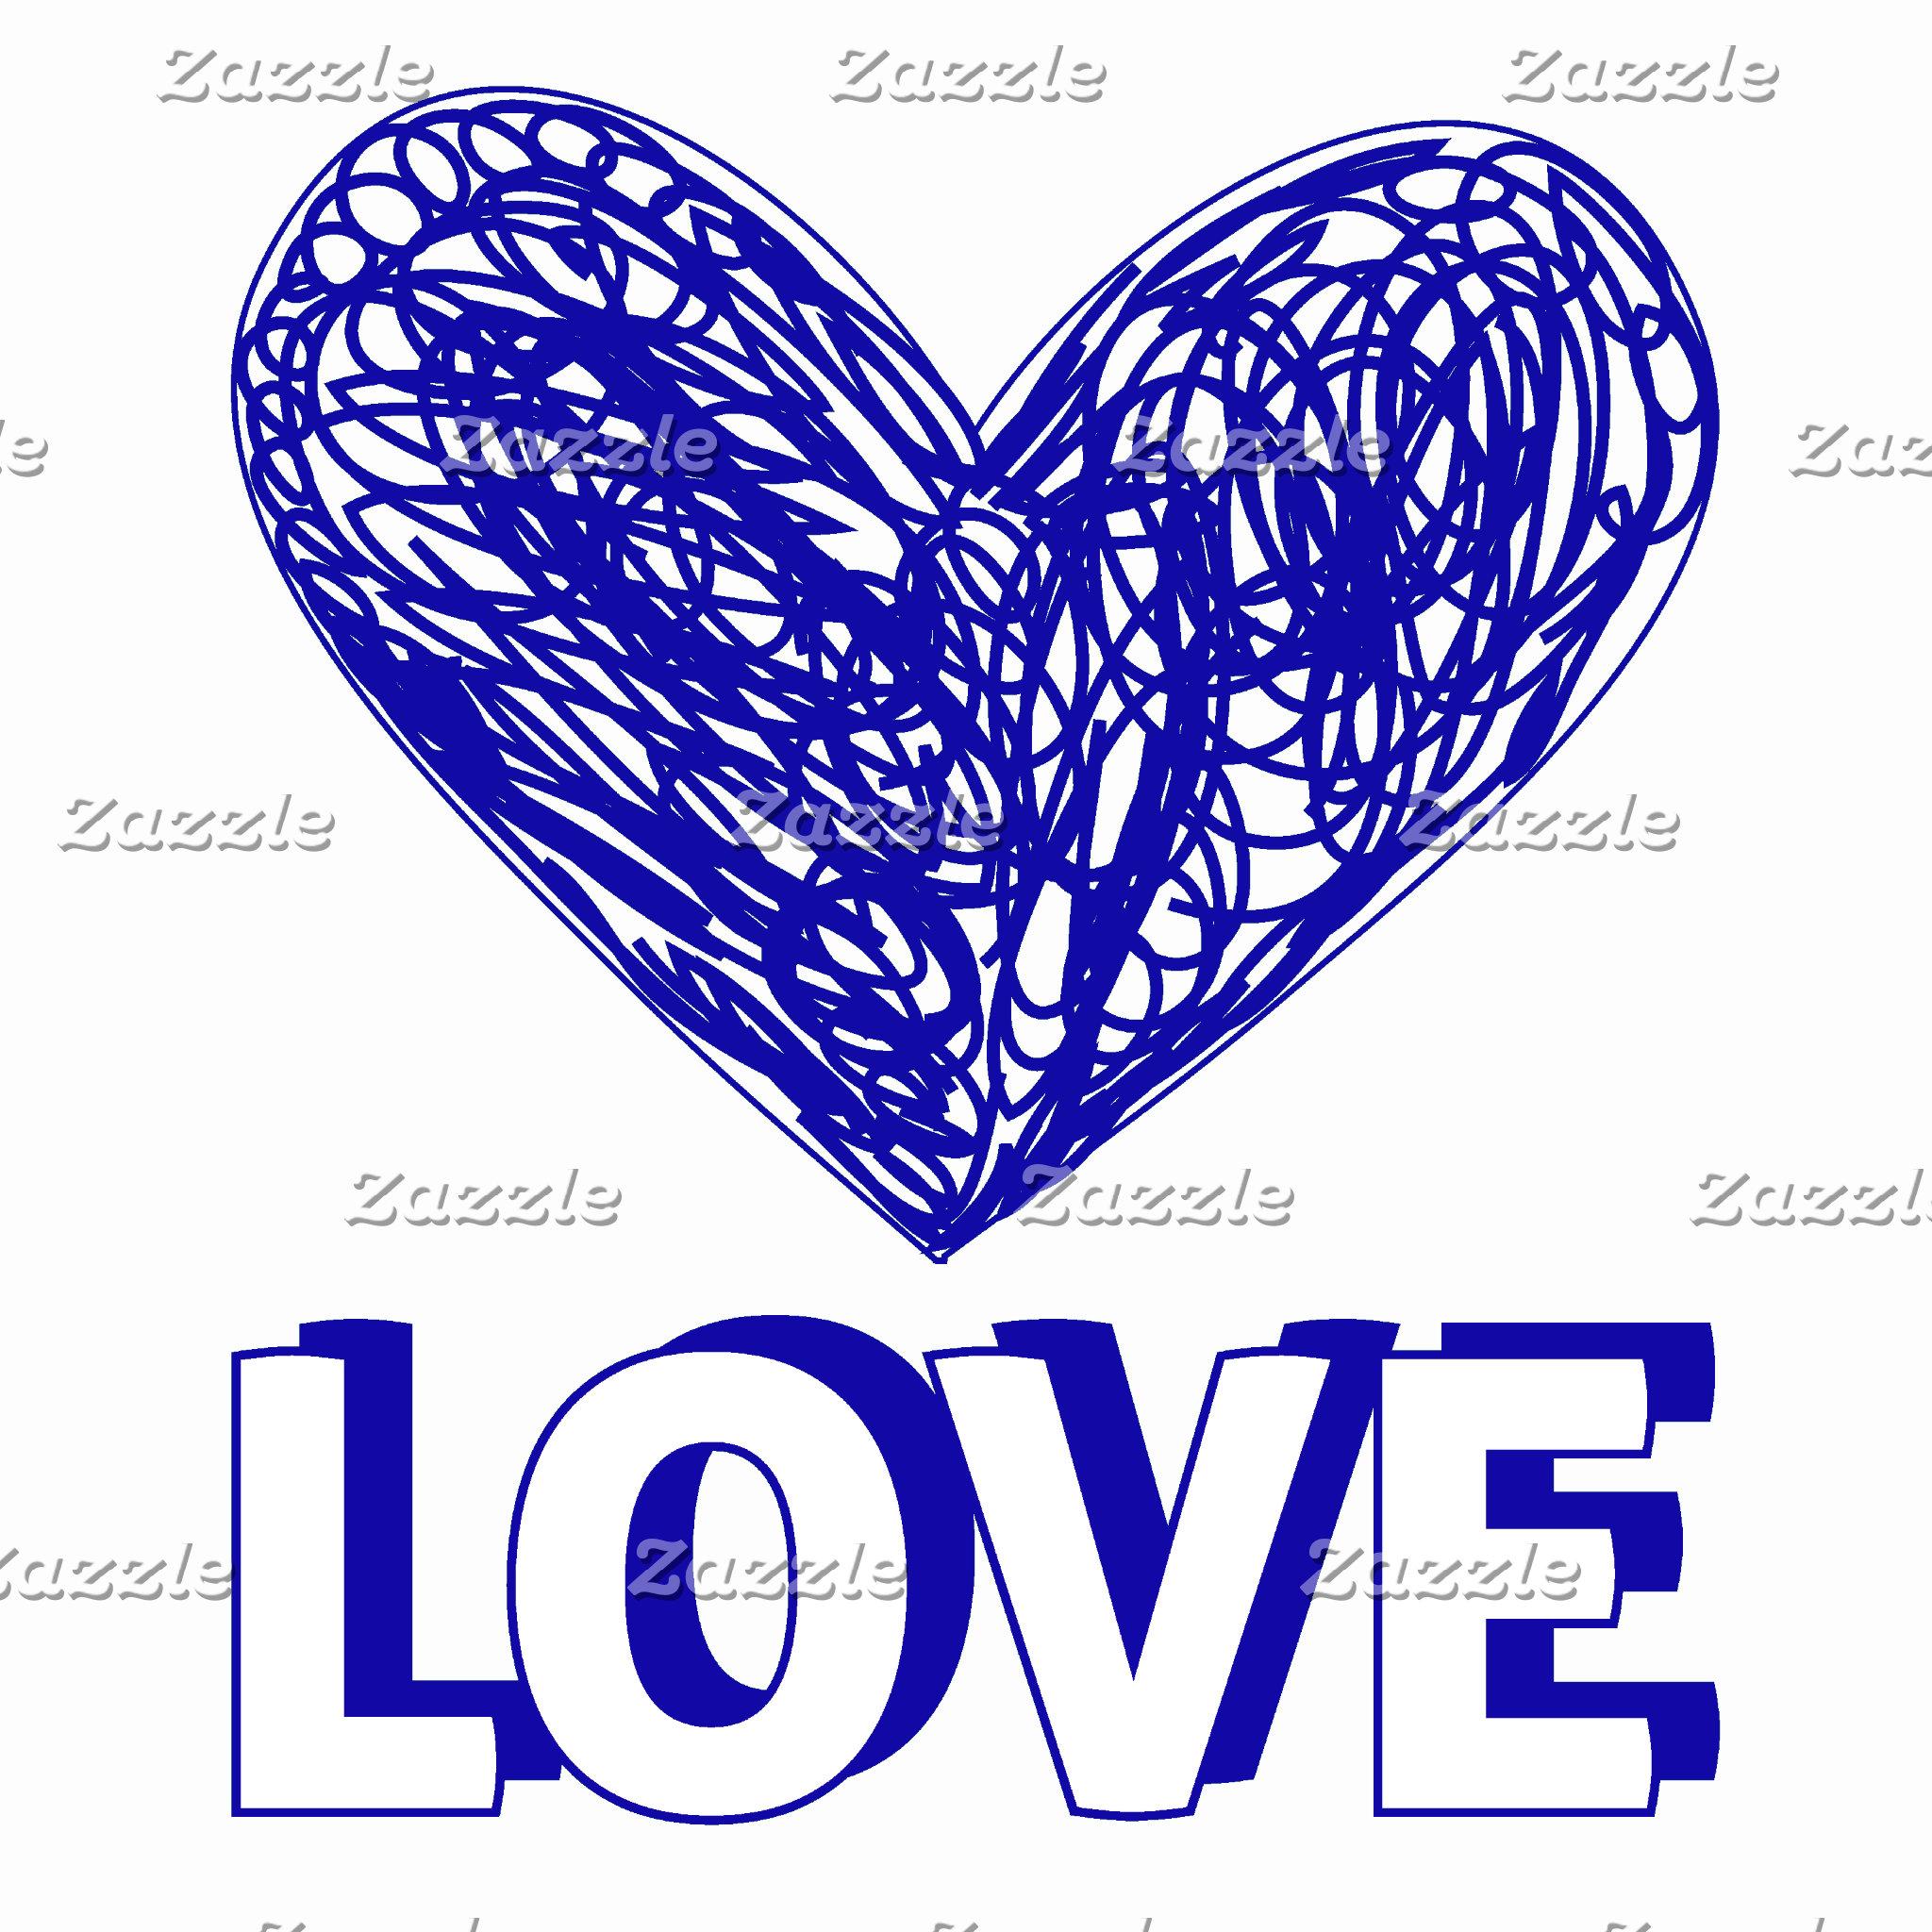 Love Romance Relationship